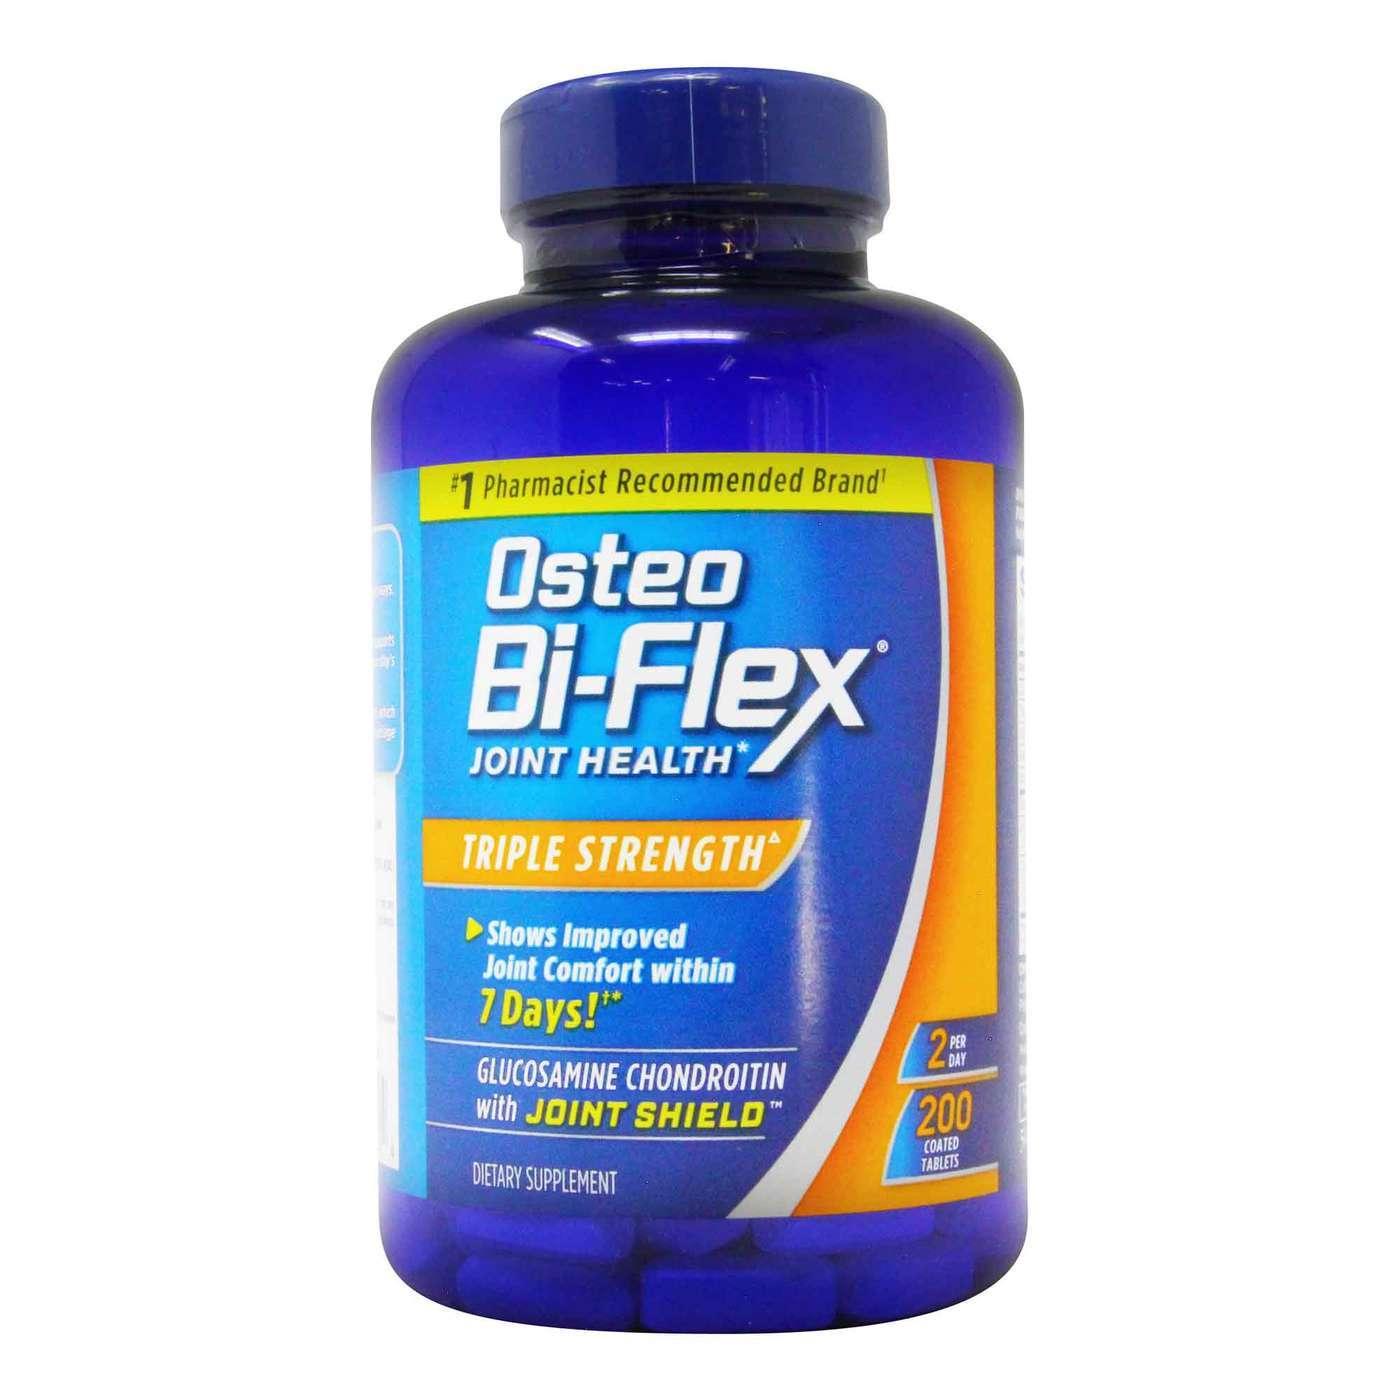 Osteo Bi-Flex, Joint Health, Triple Strength 200 Comprimidos